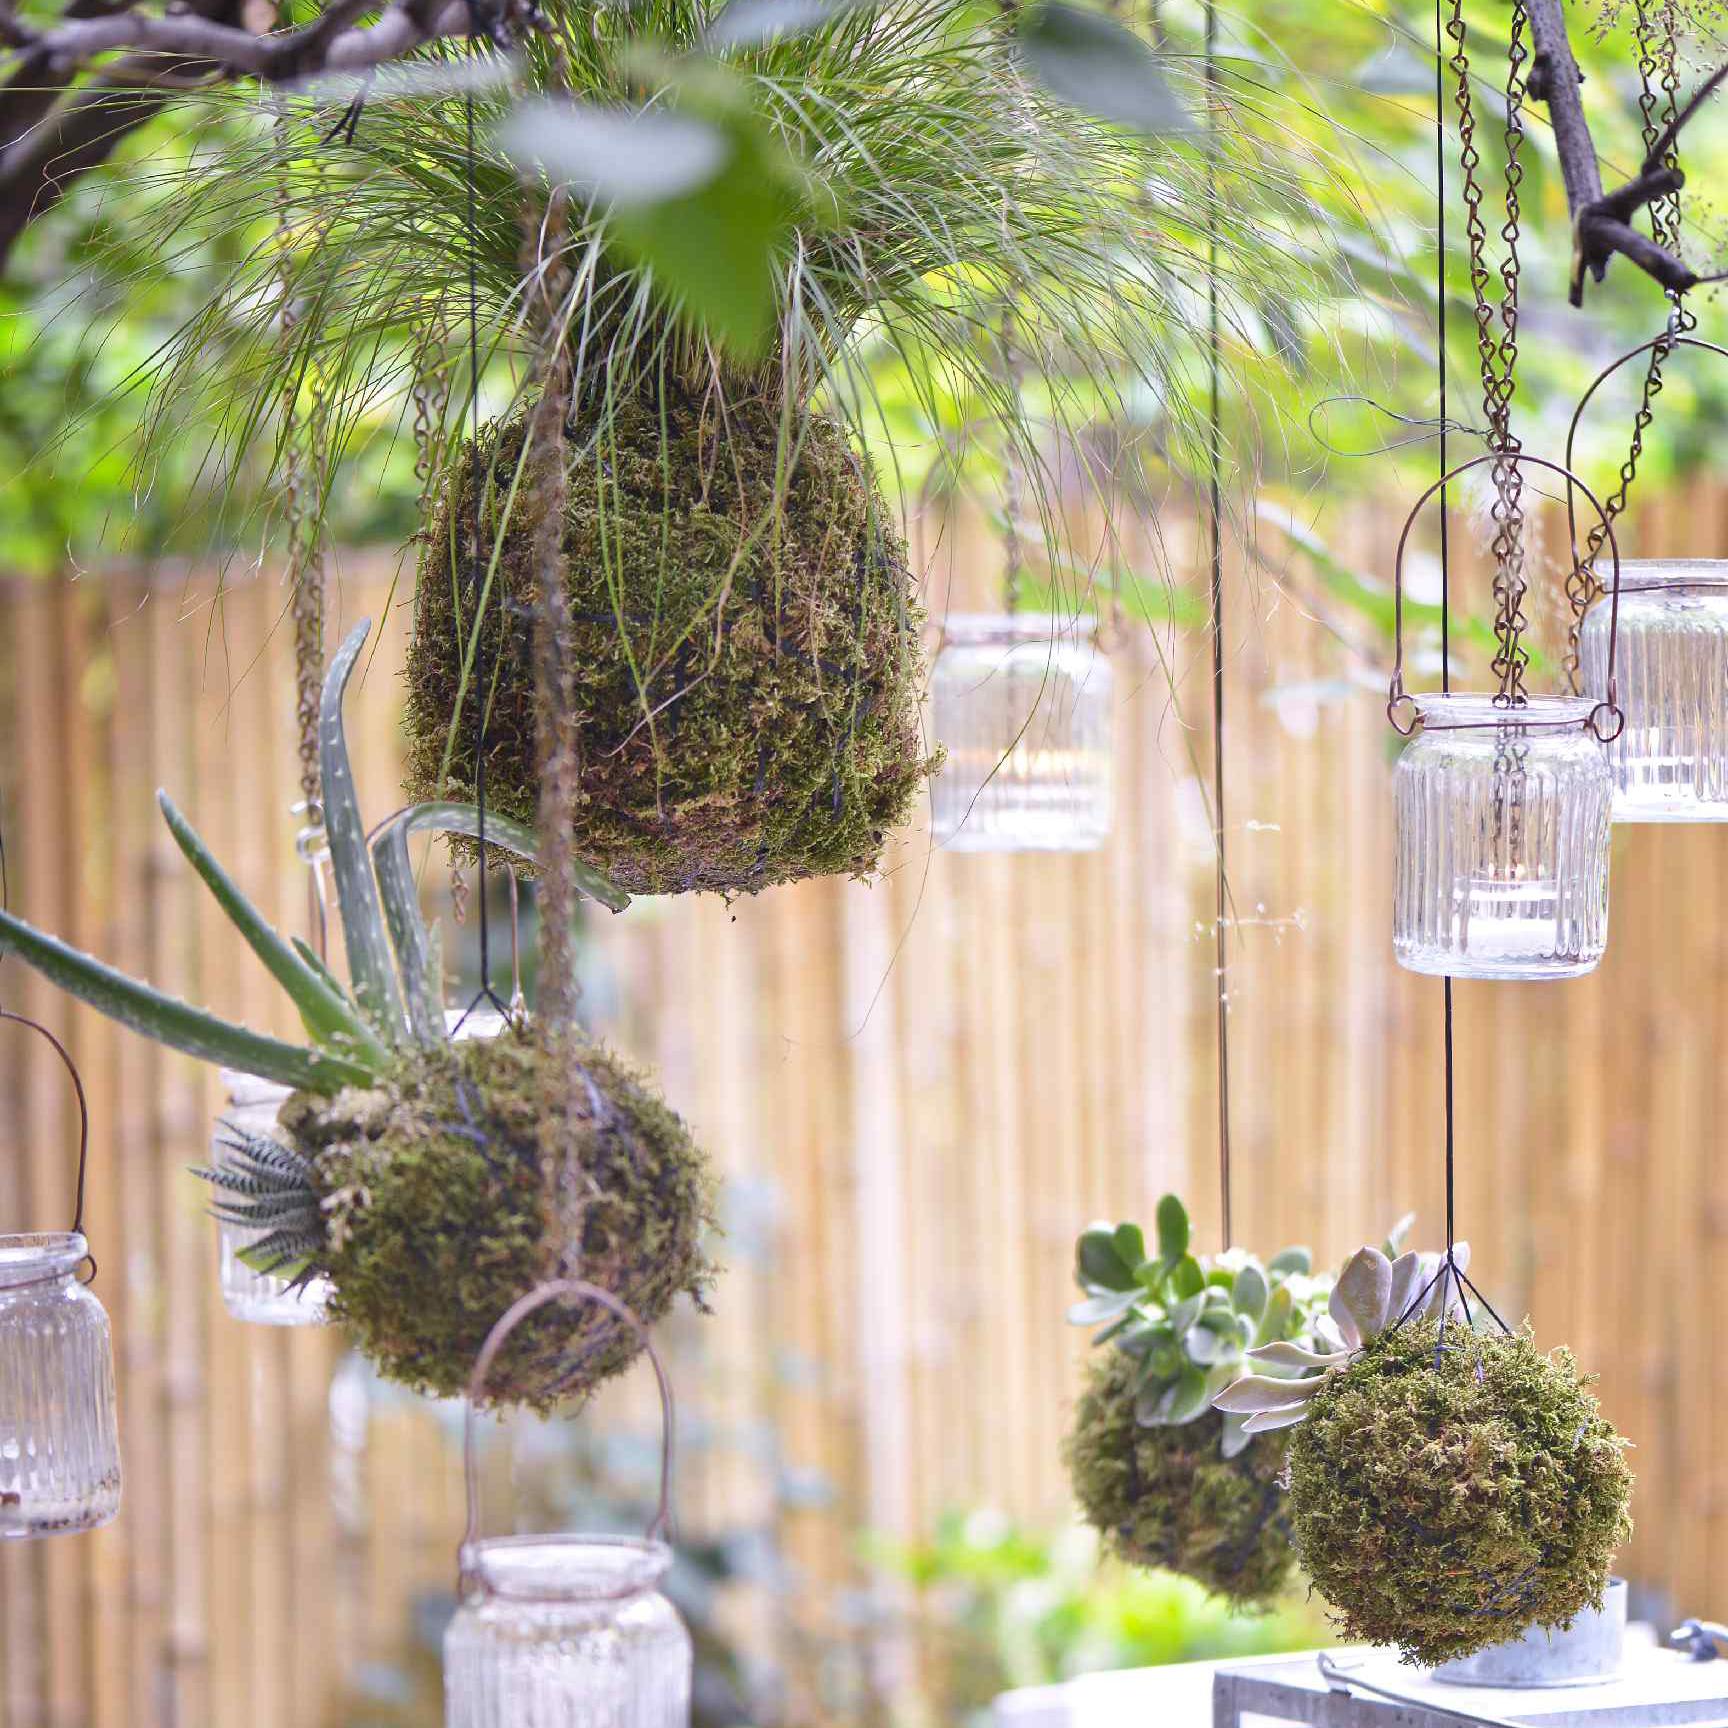 Moss ball planters